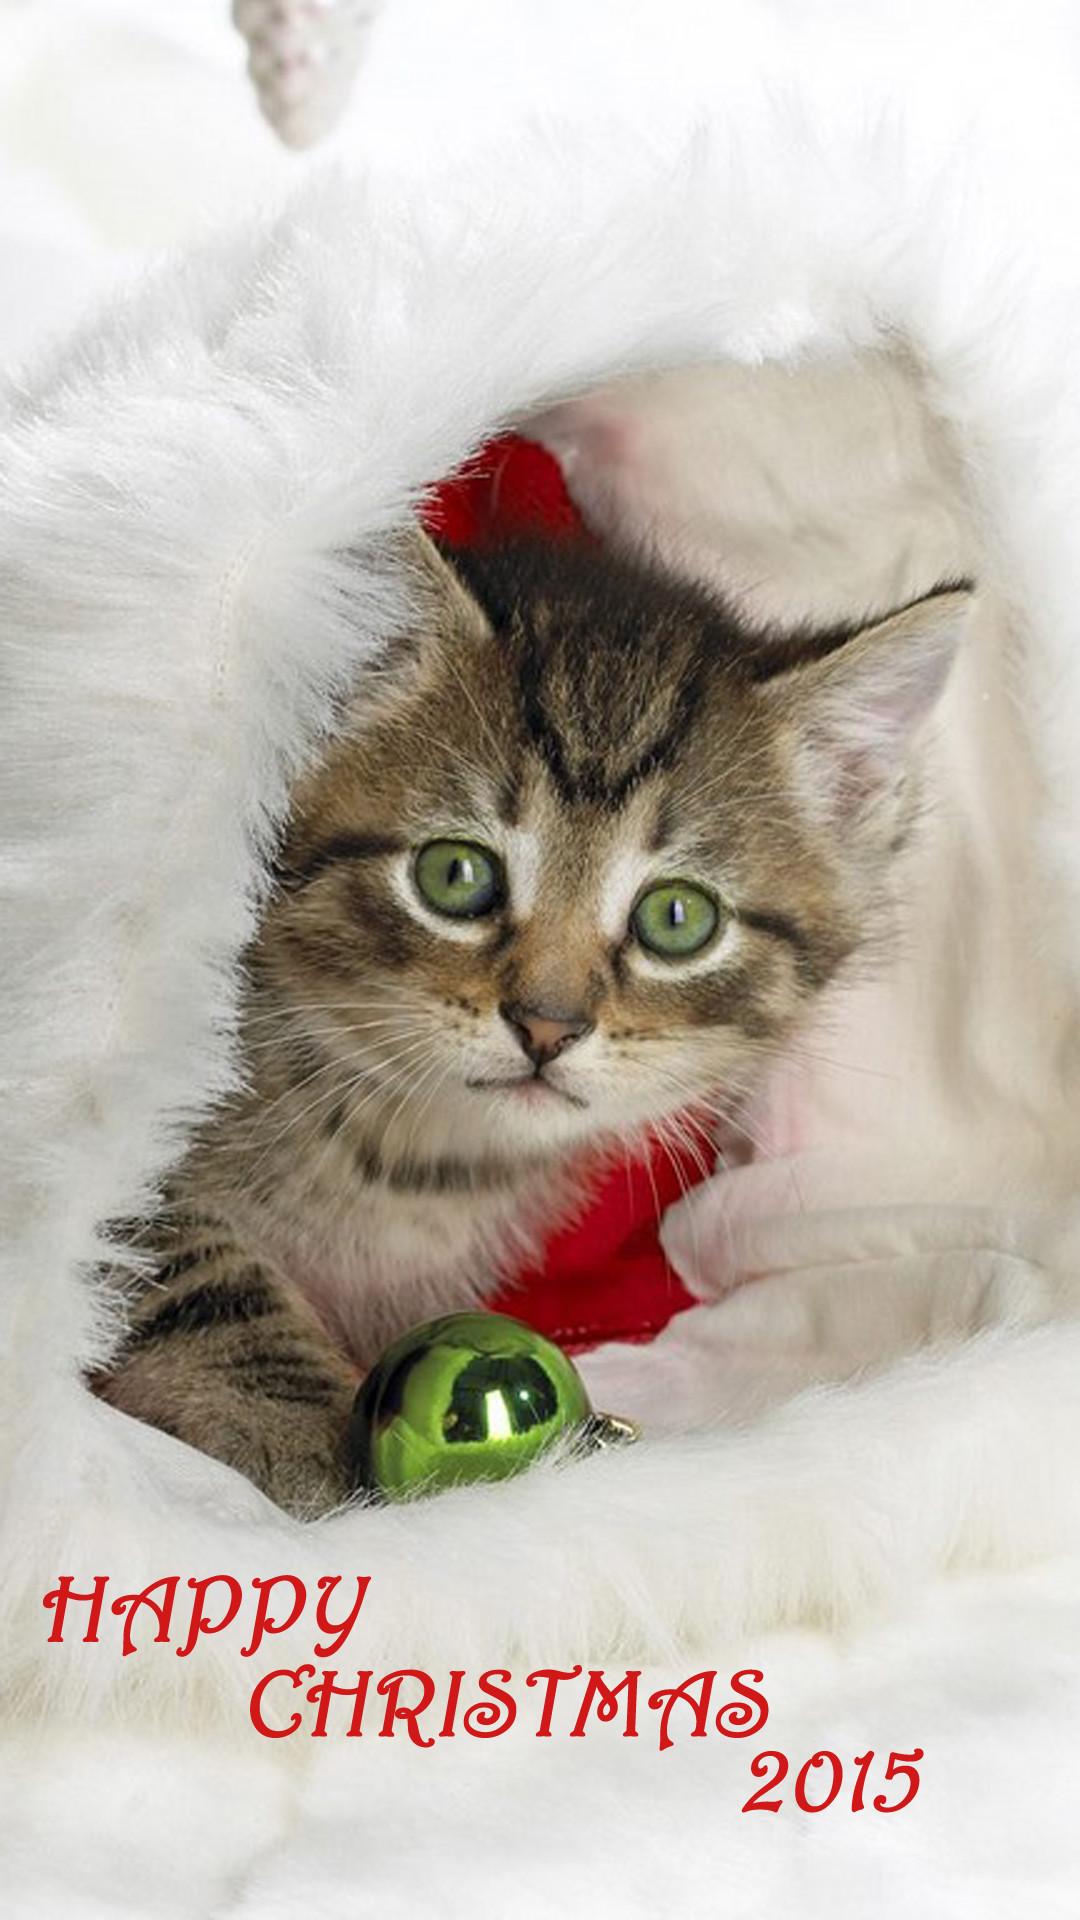 Cute Kitten With Bell